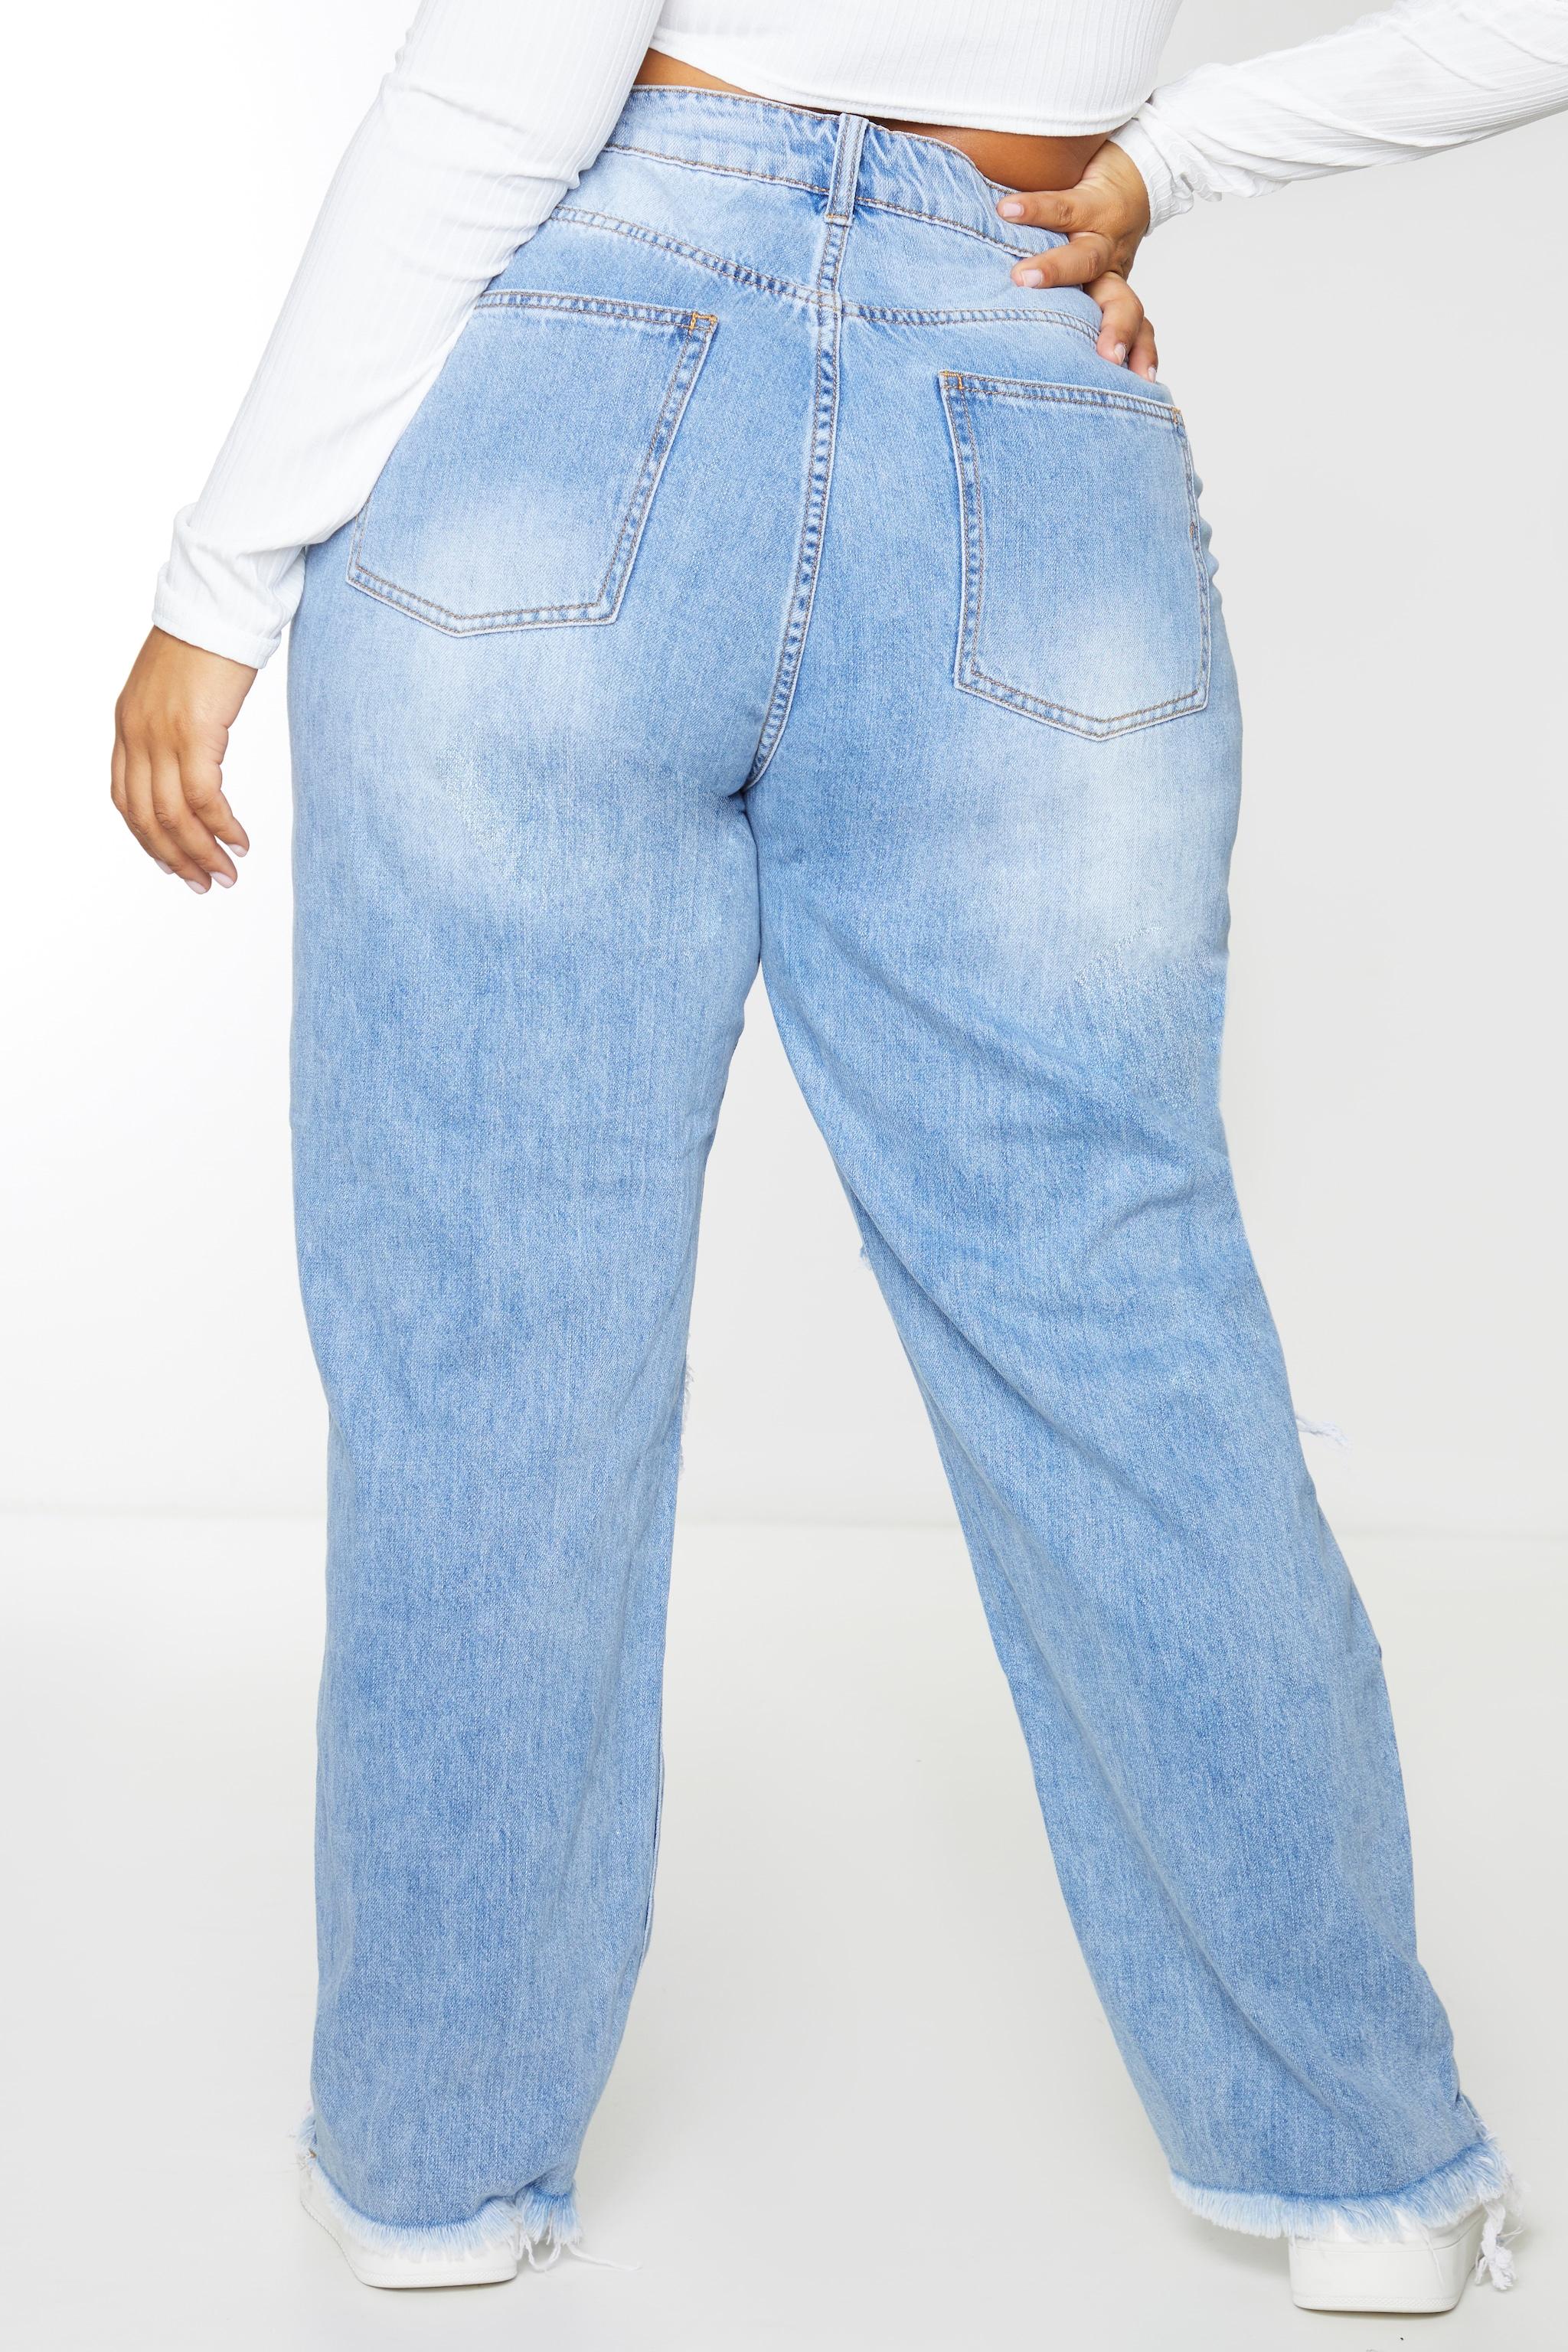 PRETTYLITTLETHING Plus Light Blue Wash Extreme Distressed Hem Boyfriend Jeans 3